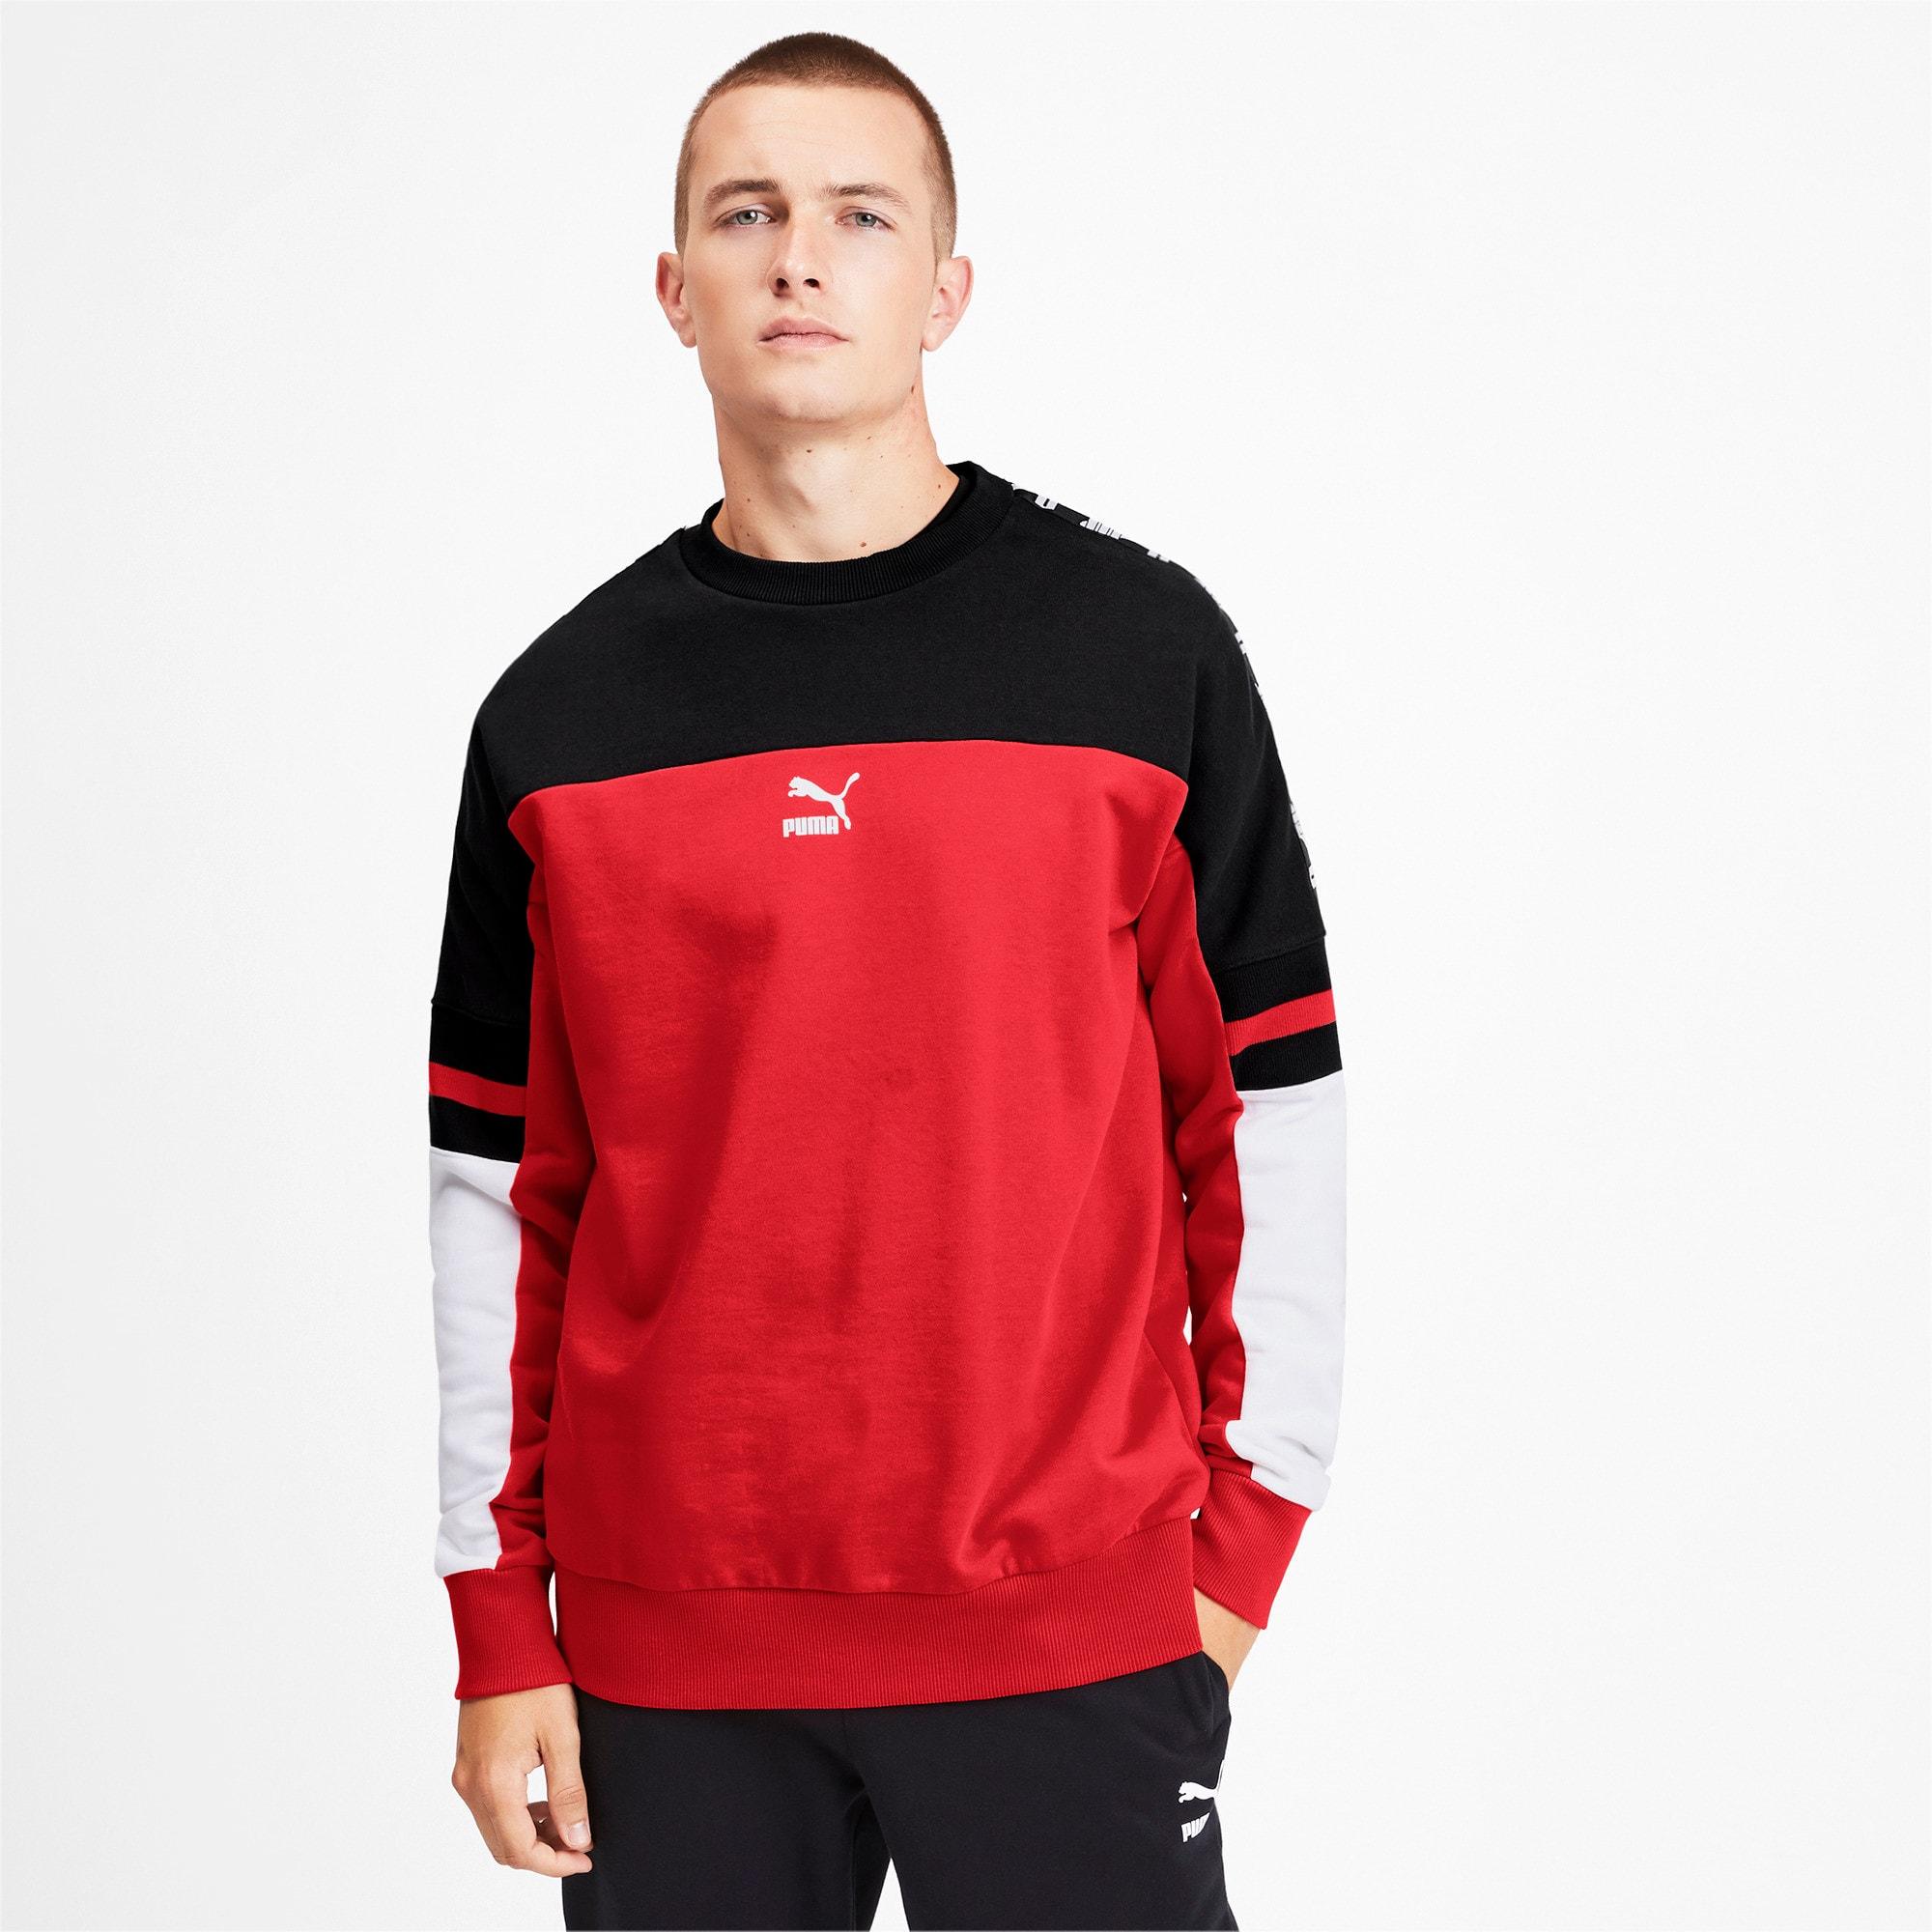 Thumbnail 1 of PUMA XTG Men's Crewneck Sweatshirt, High Risk Red, medium